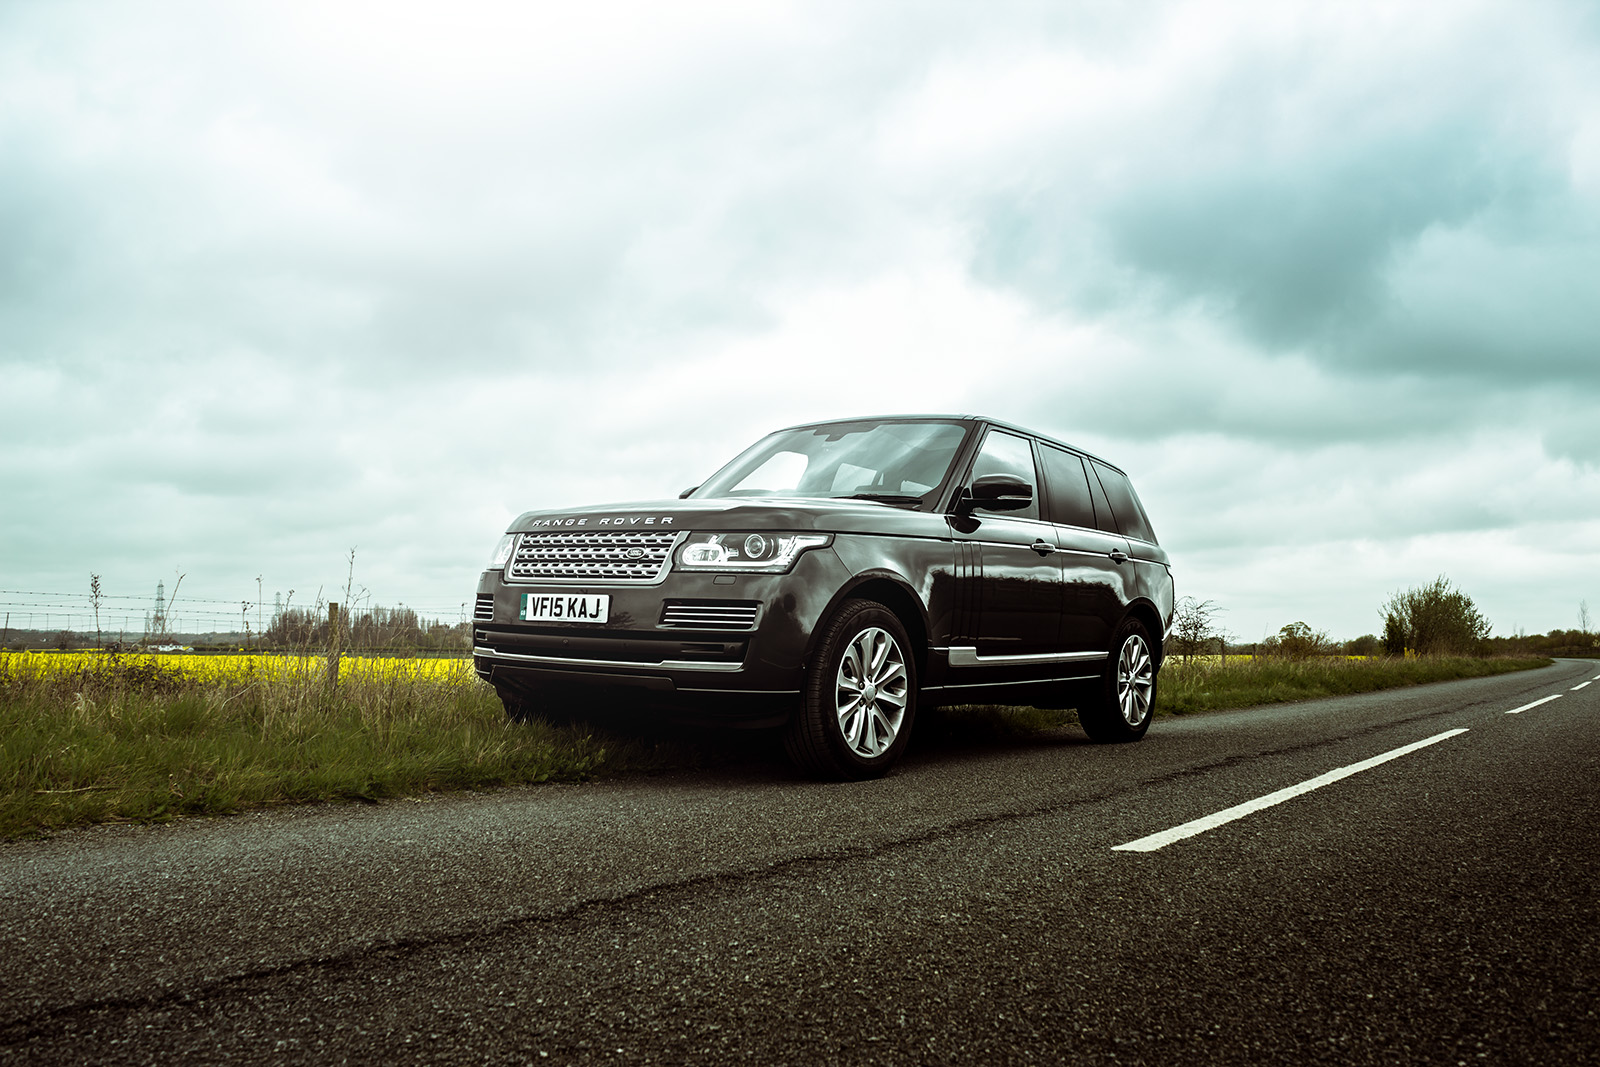 Range Rover Vogue SE 01